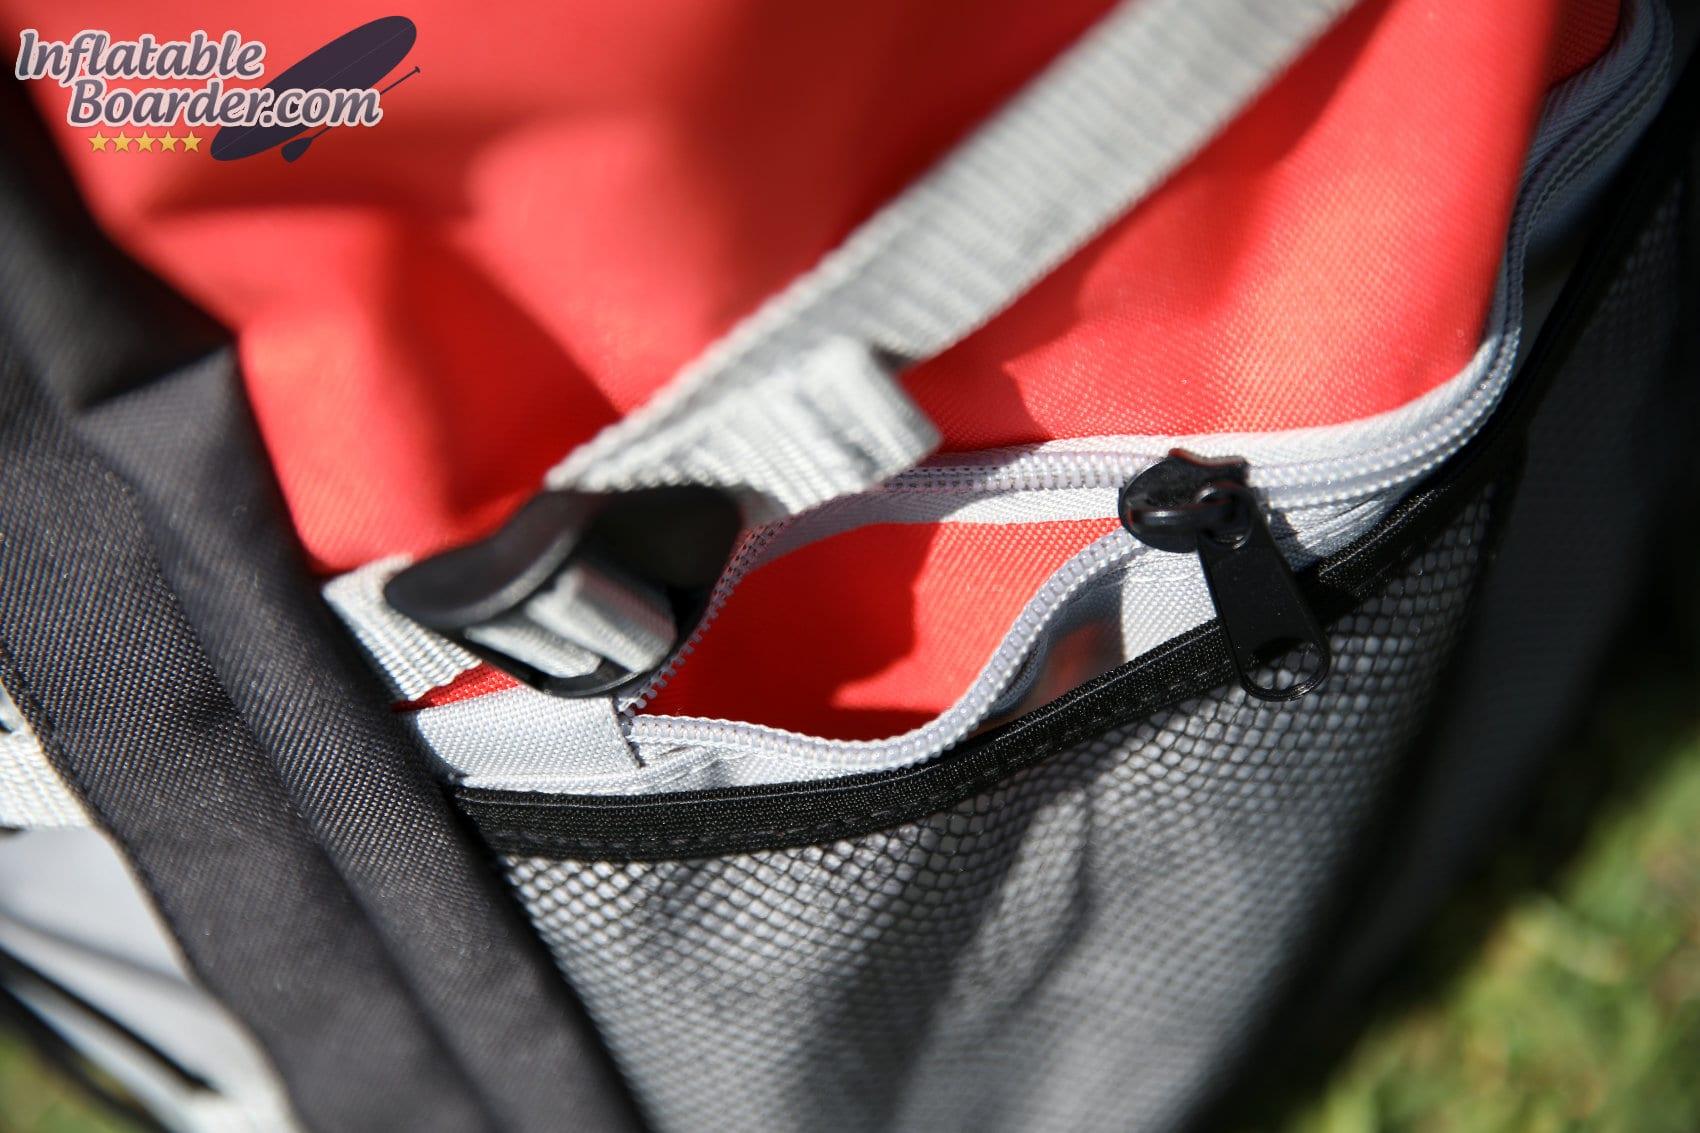 Carry Bag Zippered Pockets